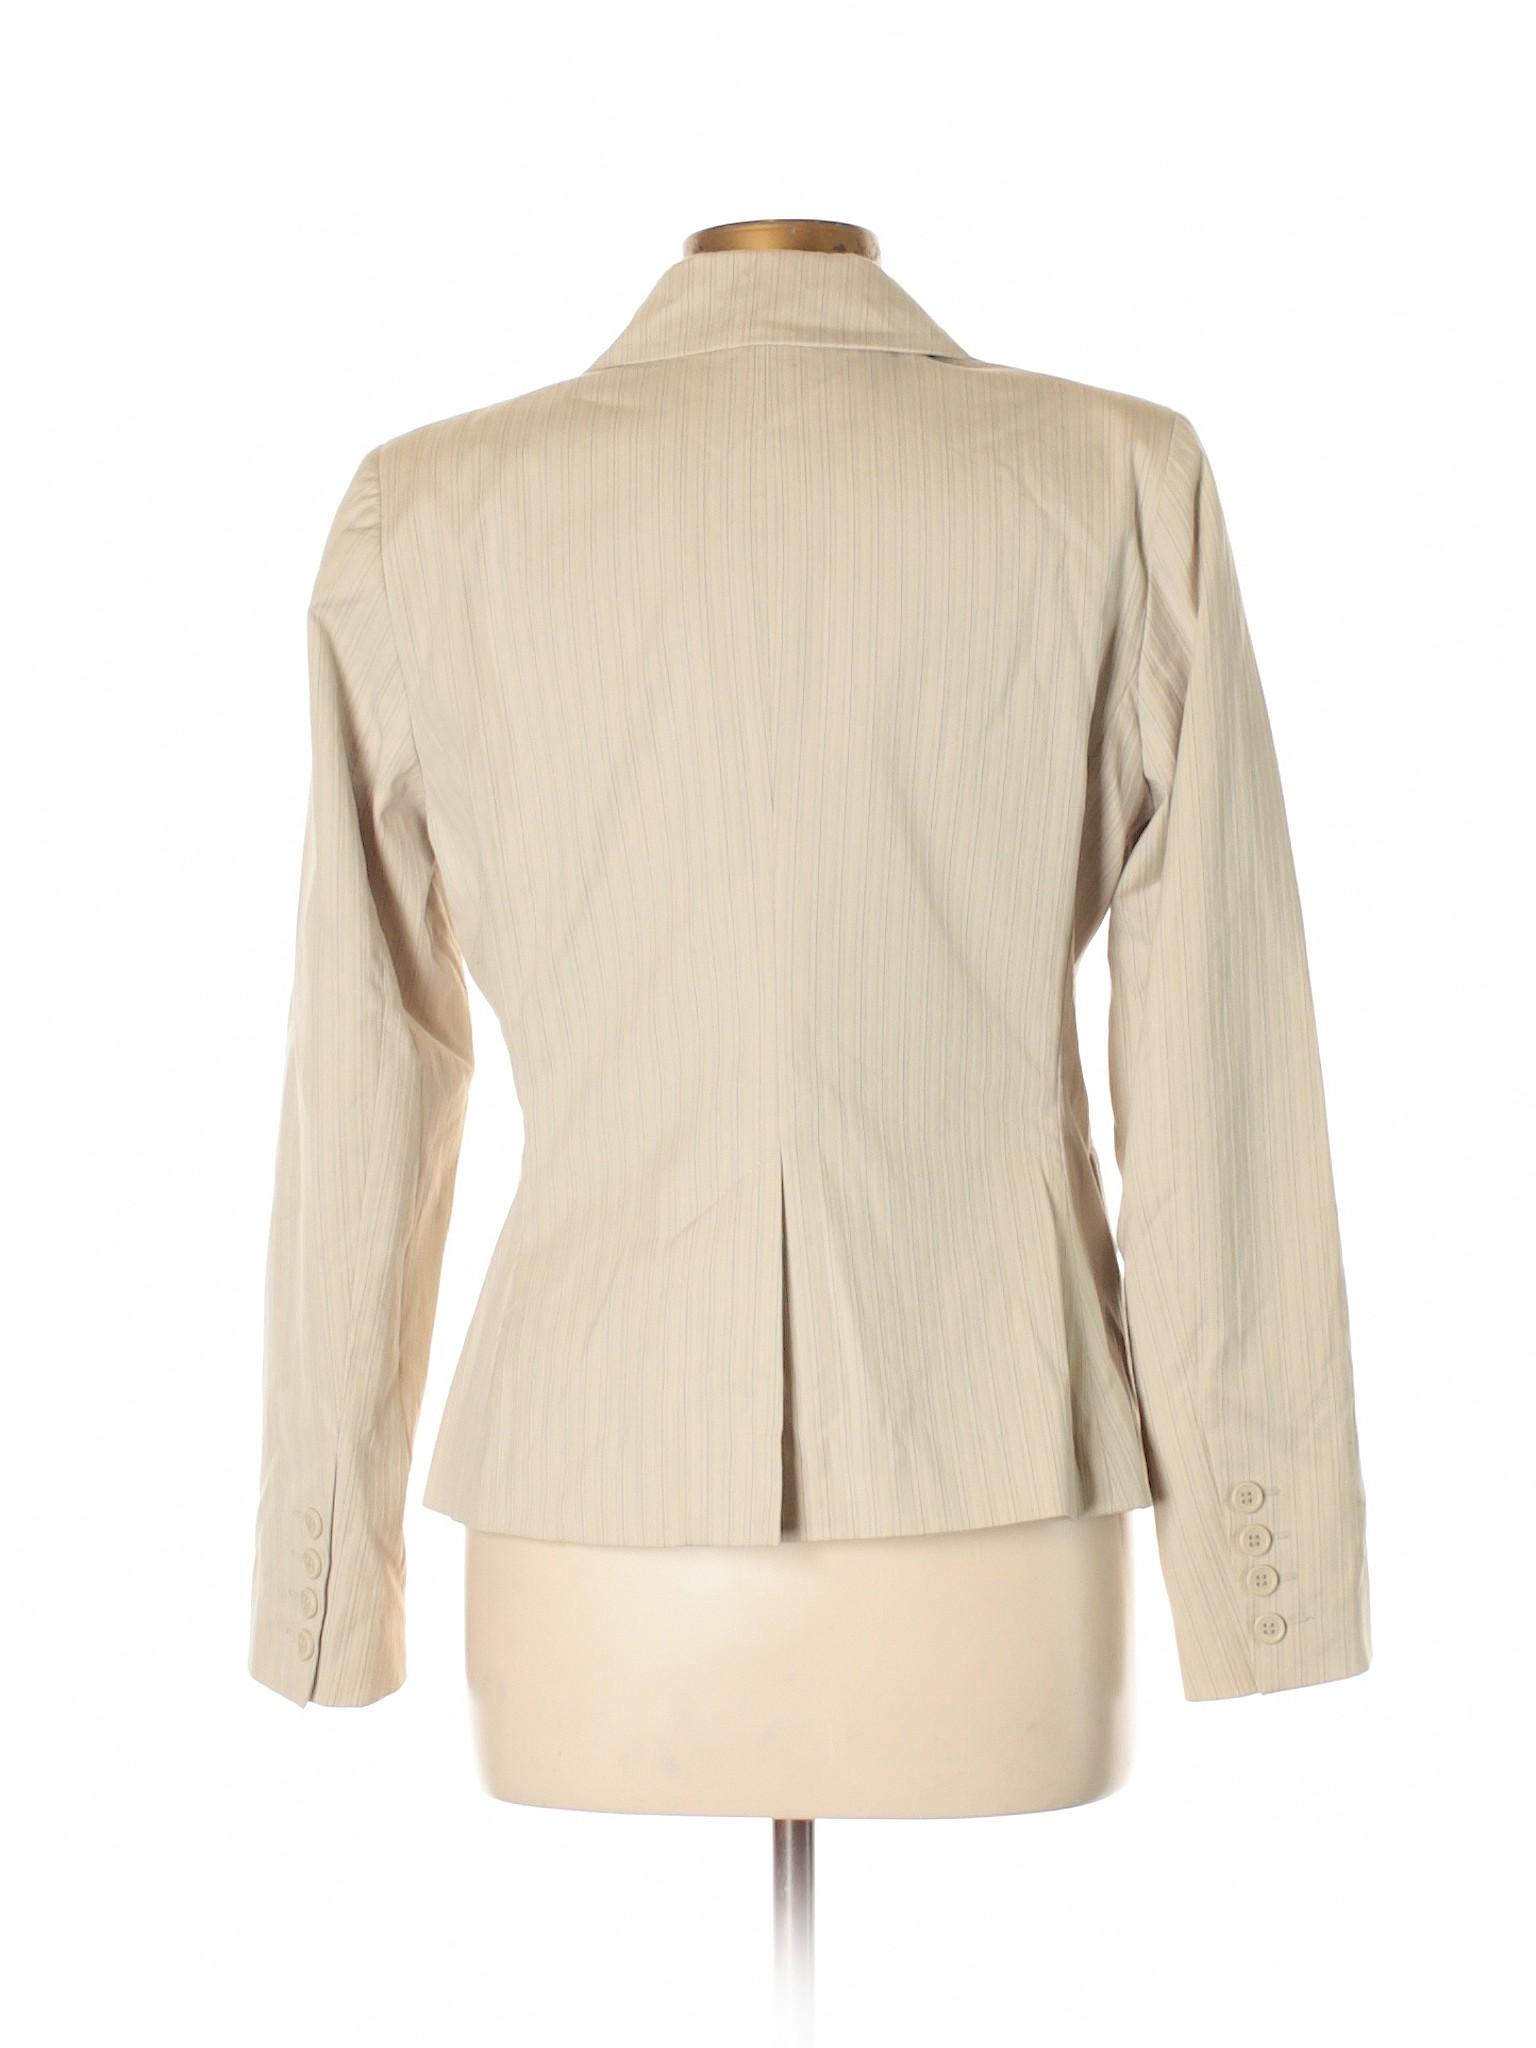 amp; New winter Boutique Blazer York Company wPqBWWSxzH